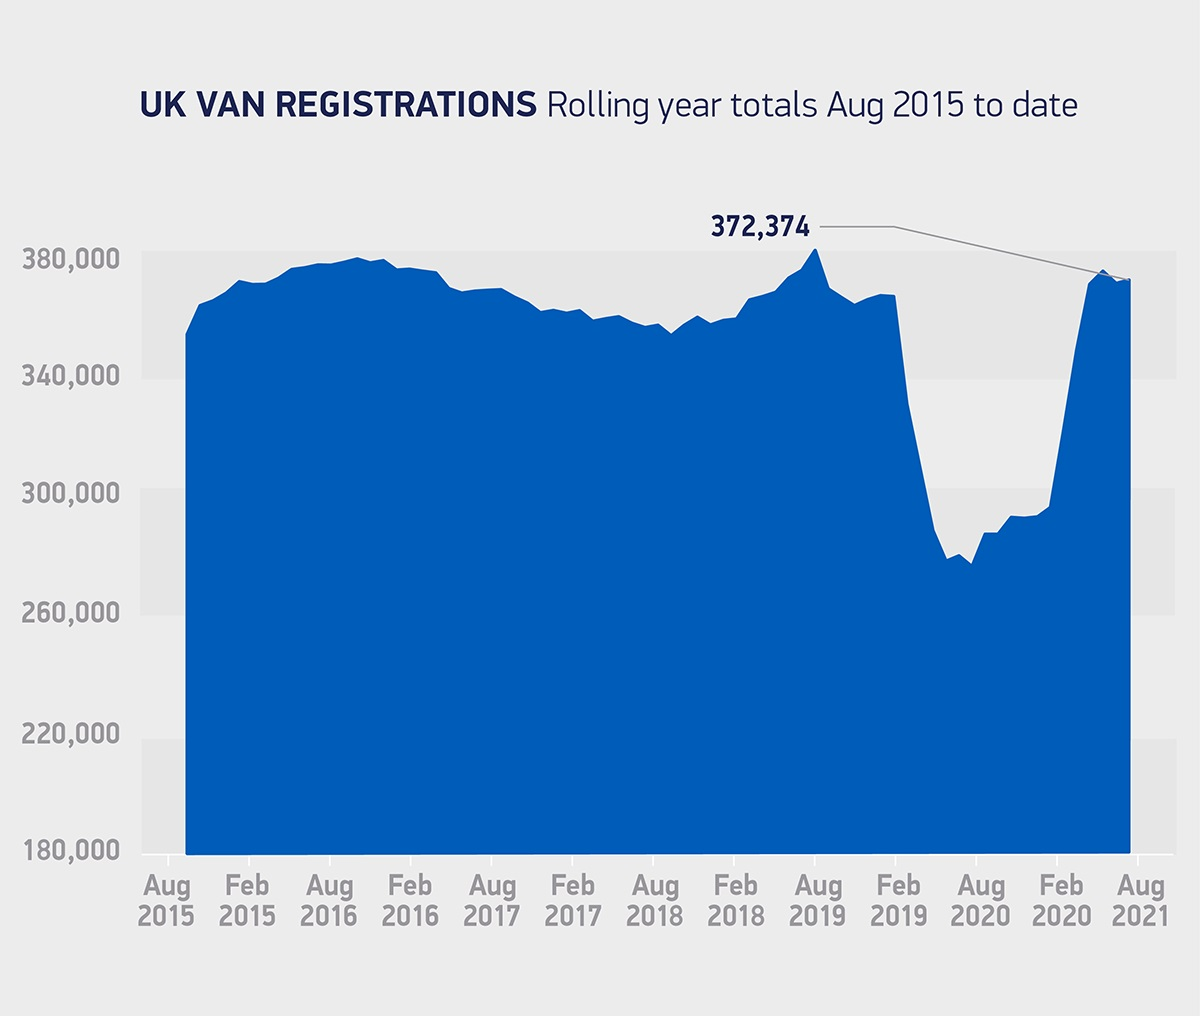 Van registrations